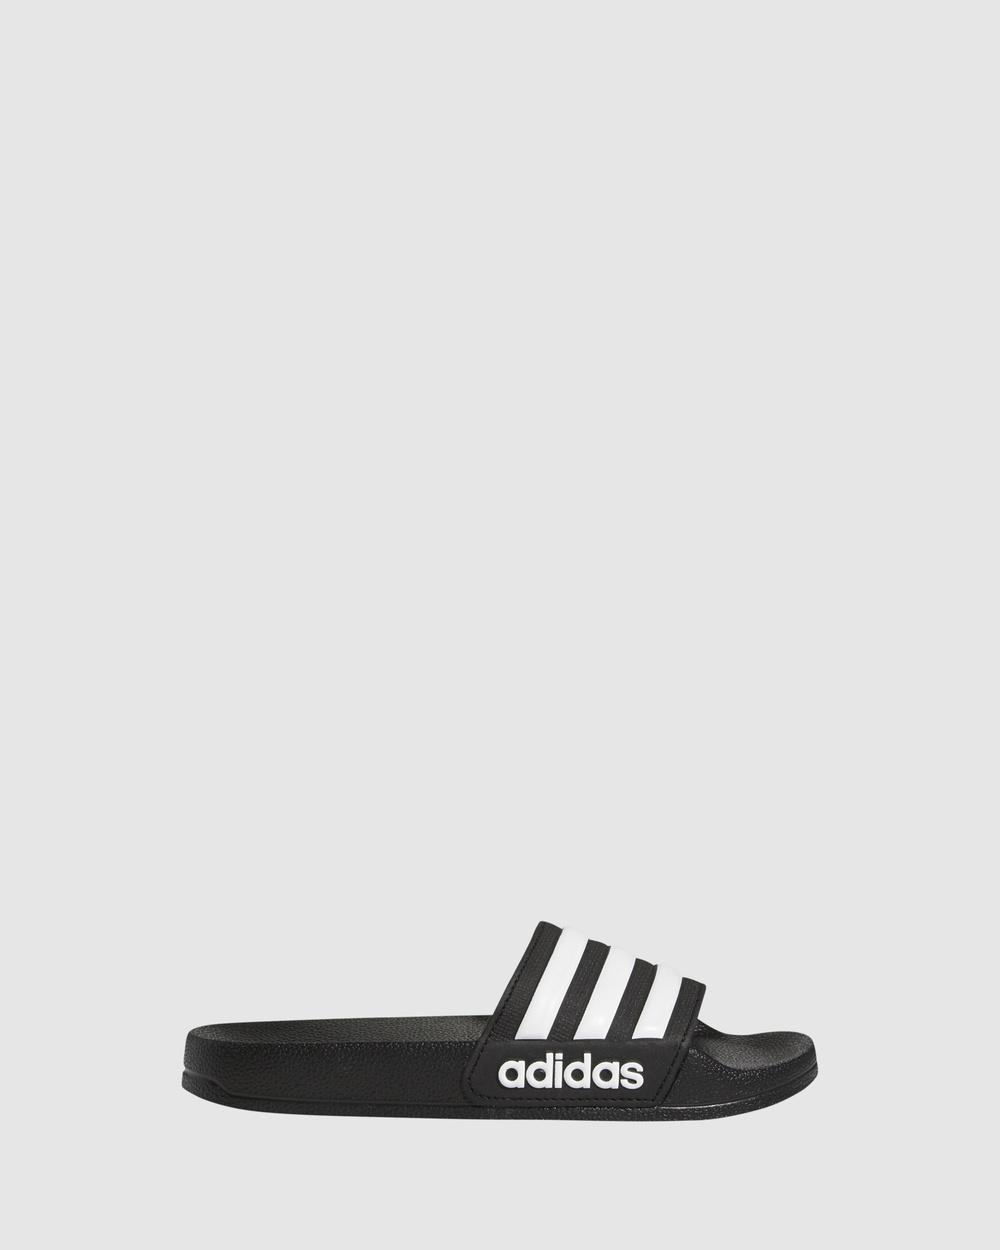 adidas Performance Adilette Shower Slides Sandals Black/White Australia